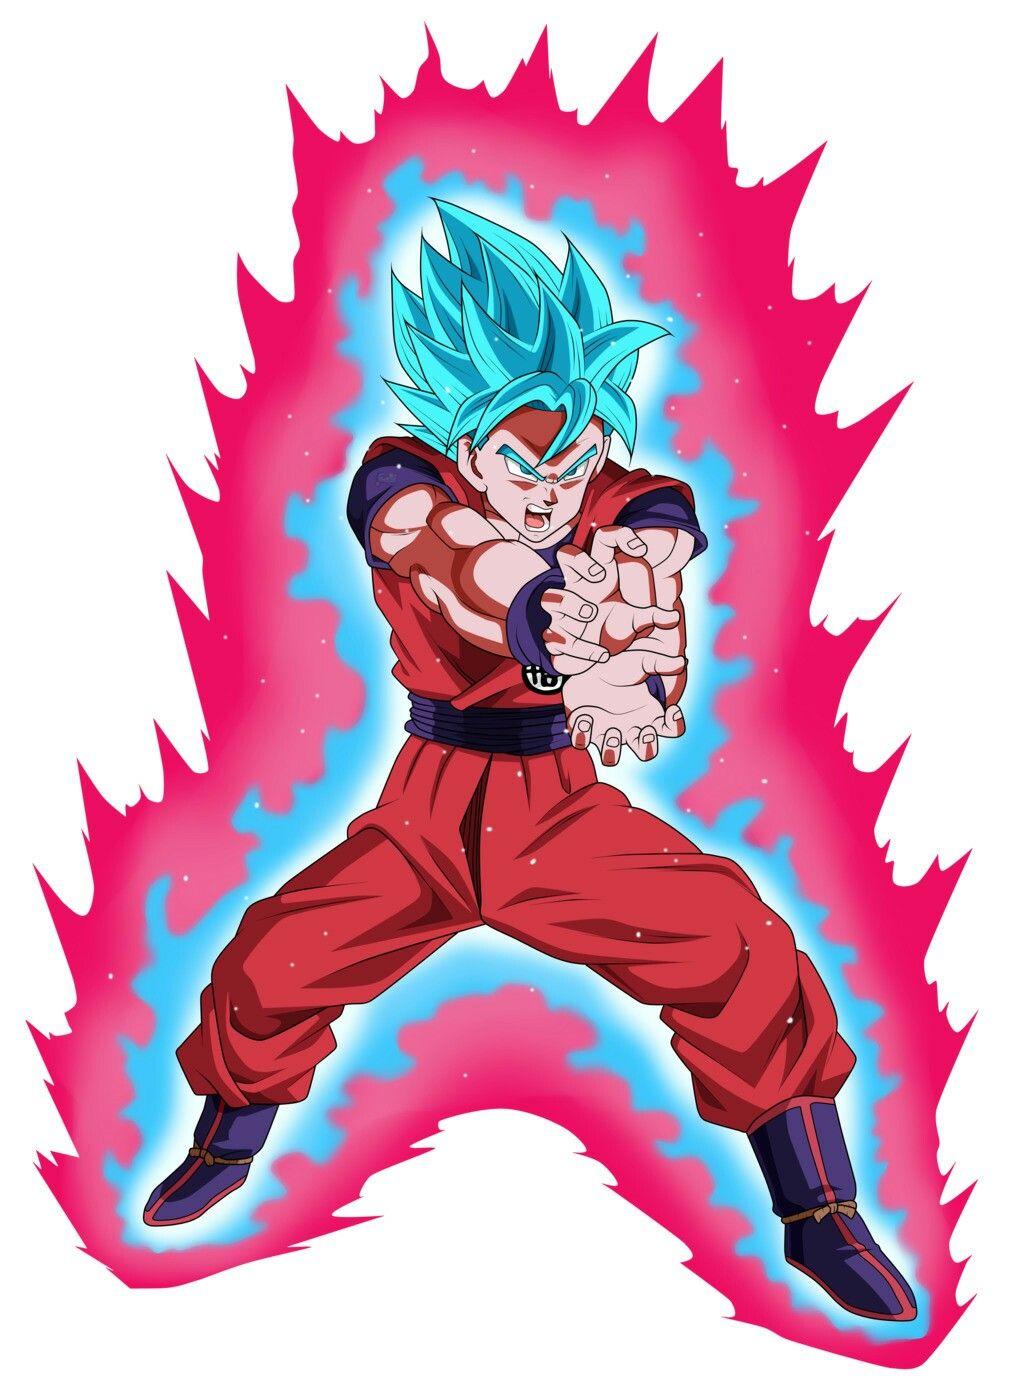 Super Saiyan God Super Saiyan Kaioken Blue By Nekoar Anime Dragon Ball Super Dragon Ball Goku Dragon Ball Super Manga